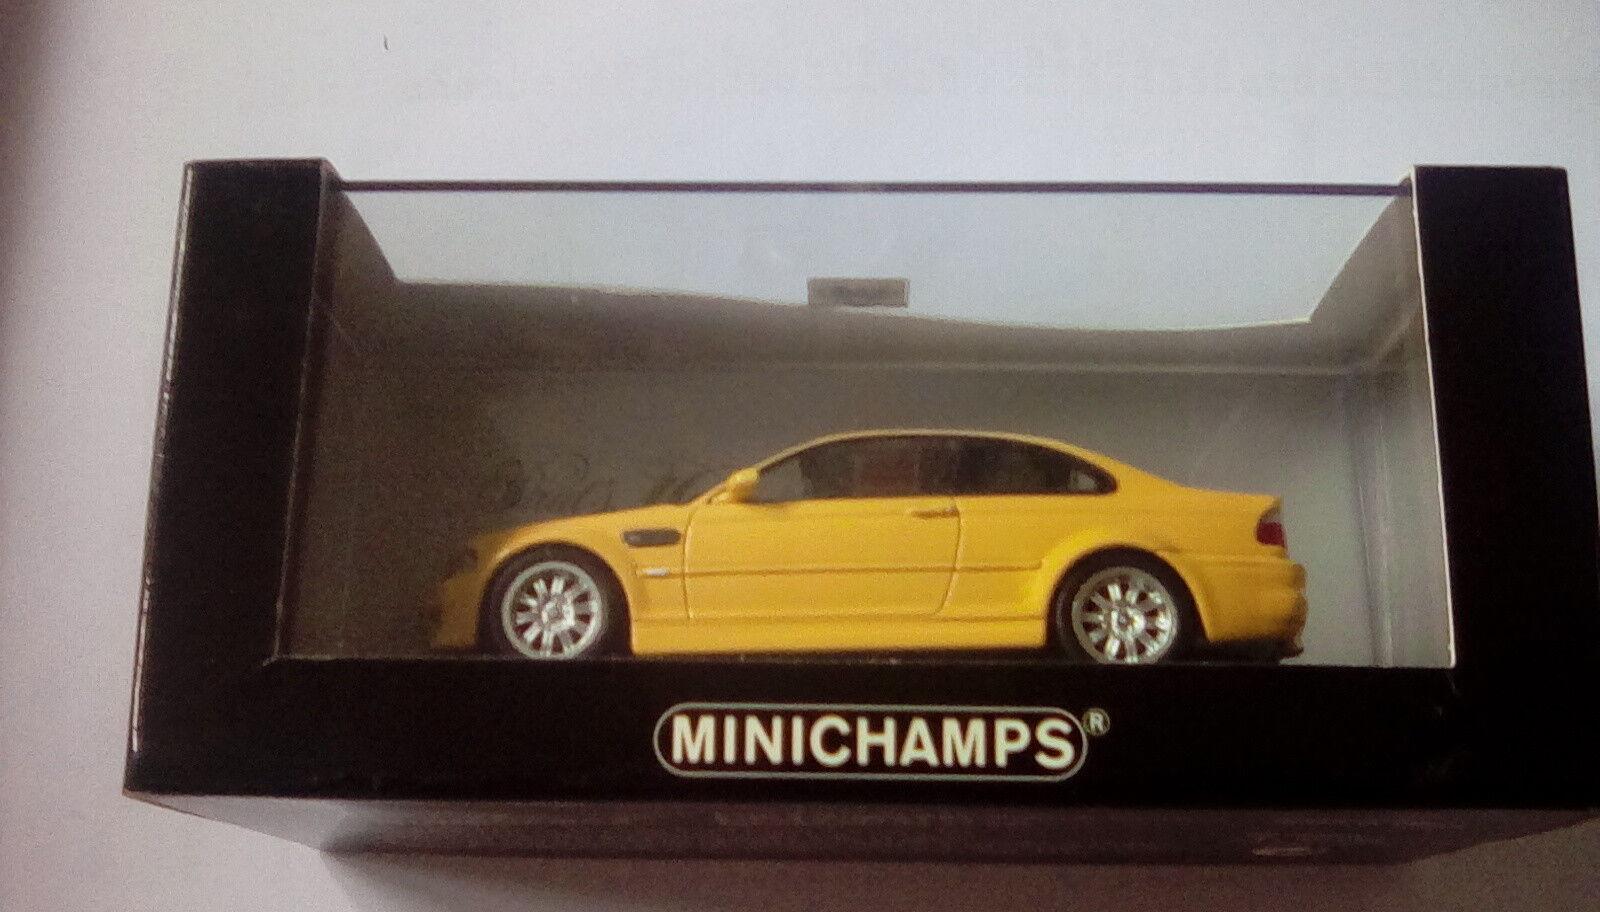 ULTRA RARE MINICHAMPS BMW M3 Coupé Dakar Jaune 1 43 1 de 2592 Comme neuf IN BOX